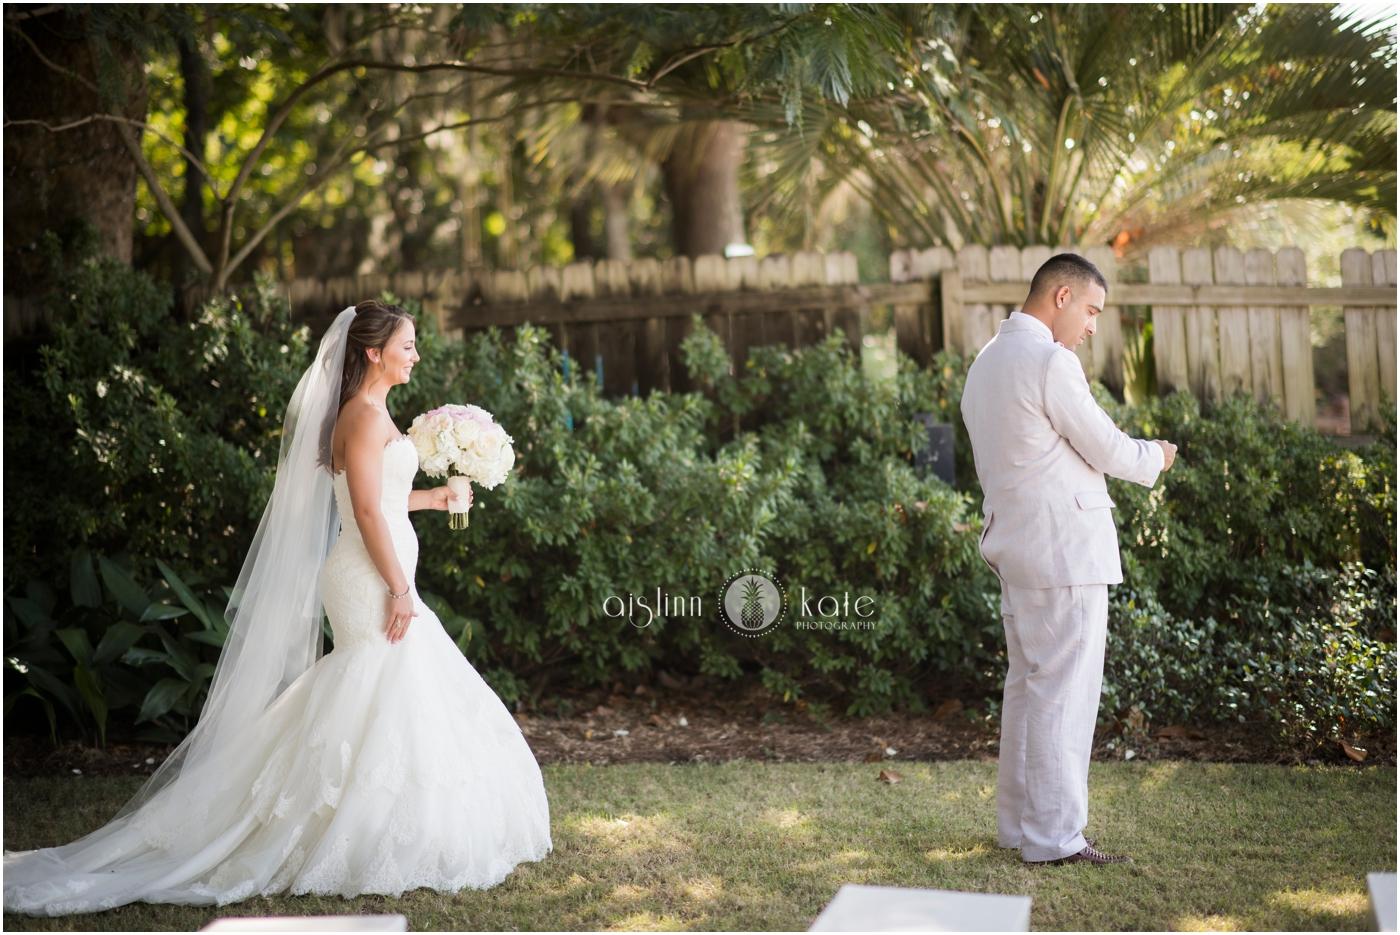 Pensacola-Destin-Wedding-Photographer_8729.jpg